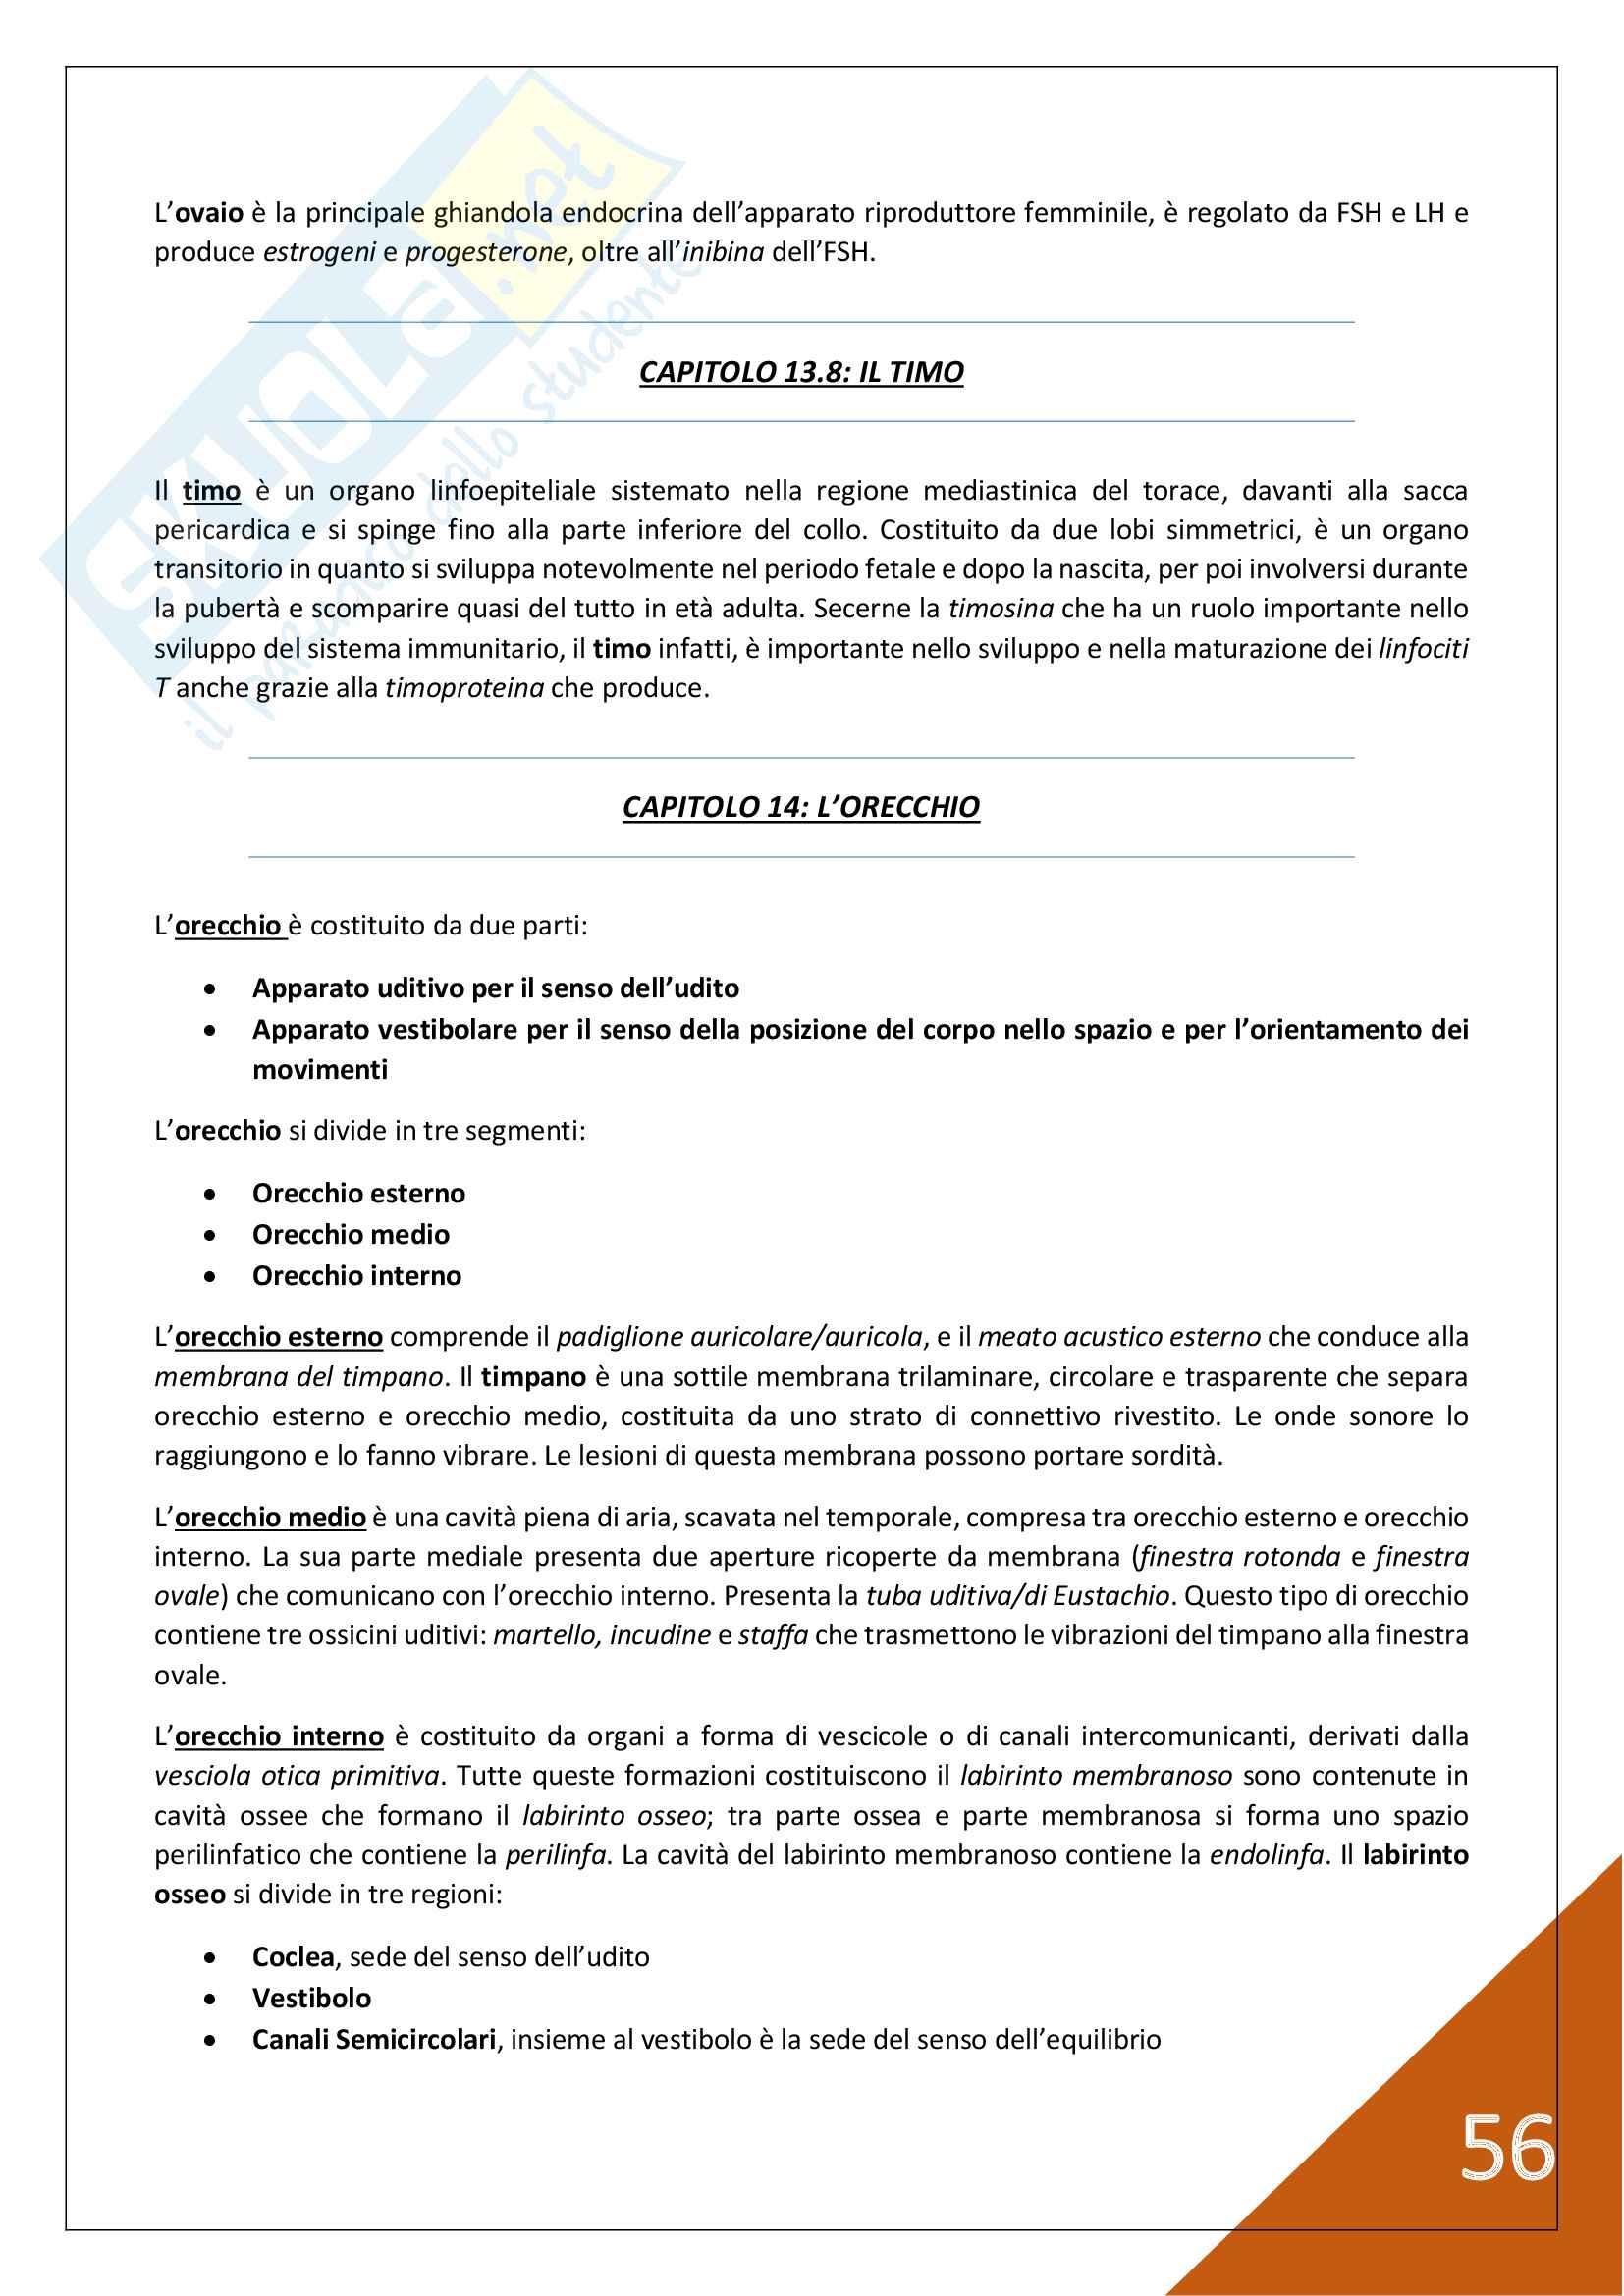 Anatomia Umana - 1° Anno Scienze Motorie Pag. 56